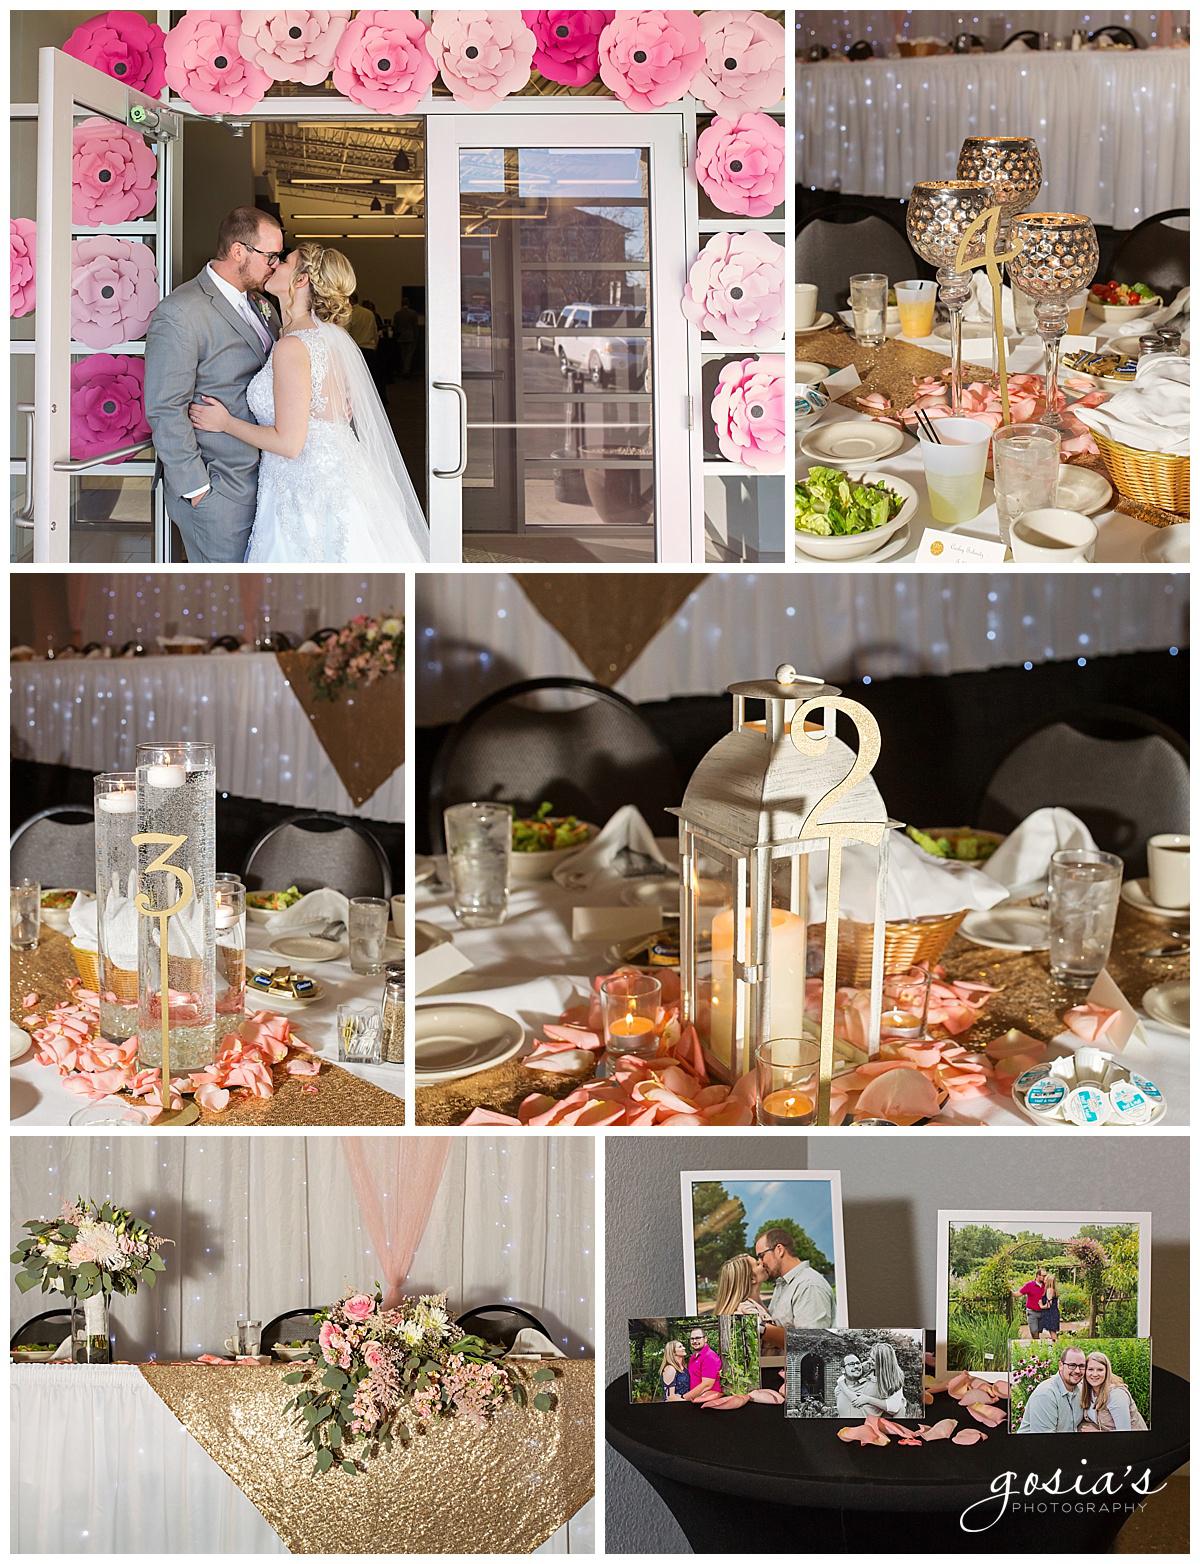 Gosias-Photography-Appleton-wedding-photographer-Fond-du-Lac-ceremony-Holiday-Inn-reception-Shelby-Ryan-_0030.jpg